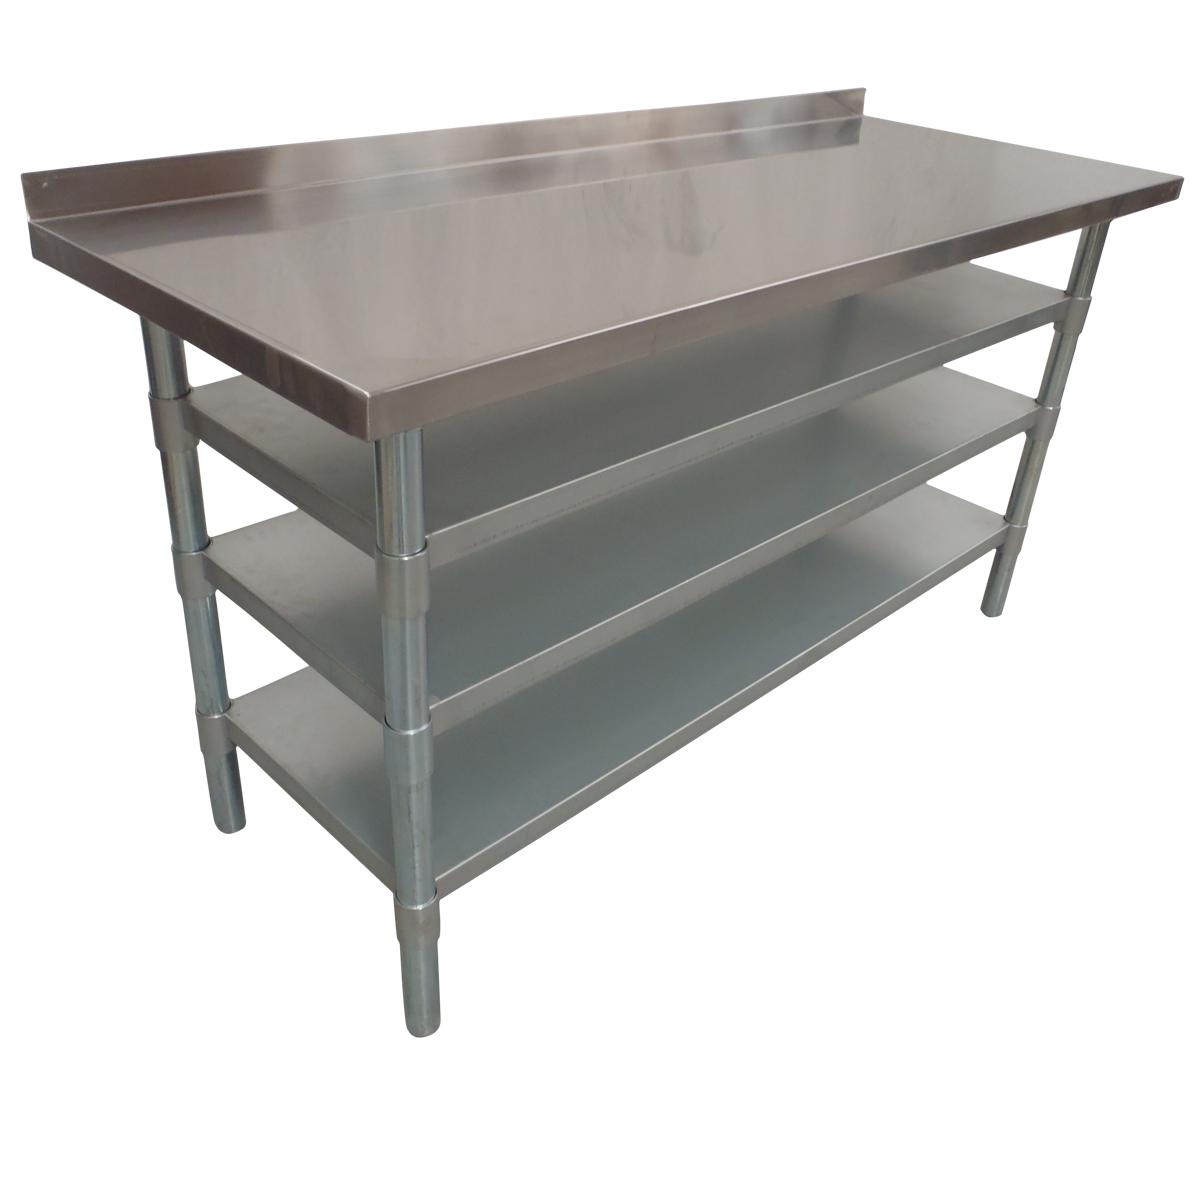 1829 x 762mm new kitchen food work bench table 3. Black Bedroom Furniture Sets. Home Design Ideas